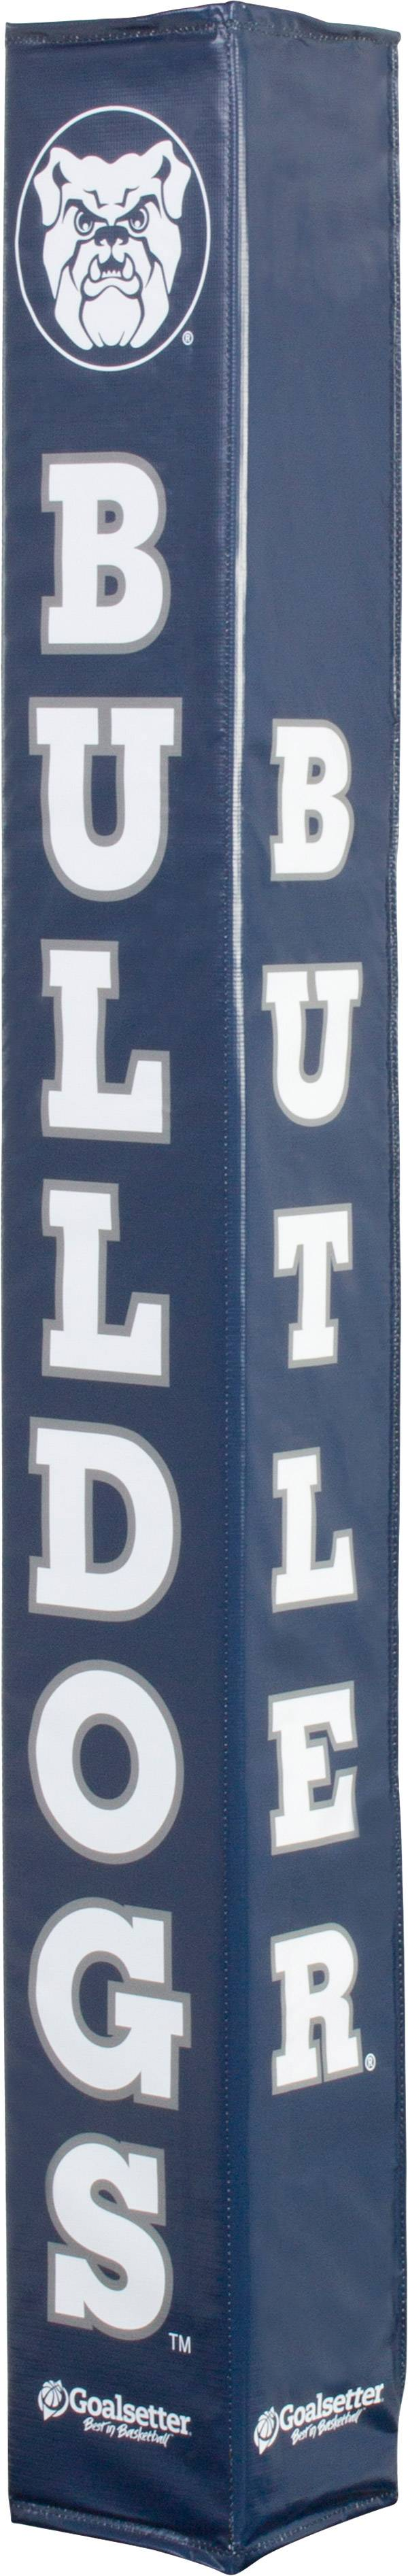 Goalsetter Butler Bulldogs Basketball Pole Pad product image